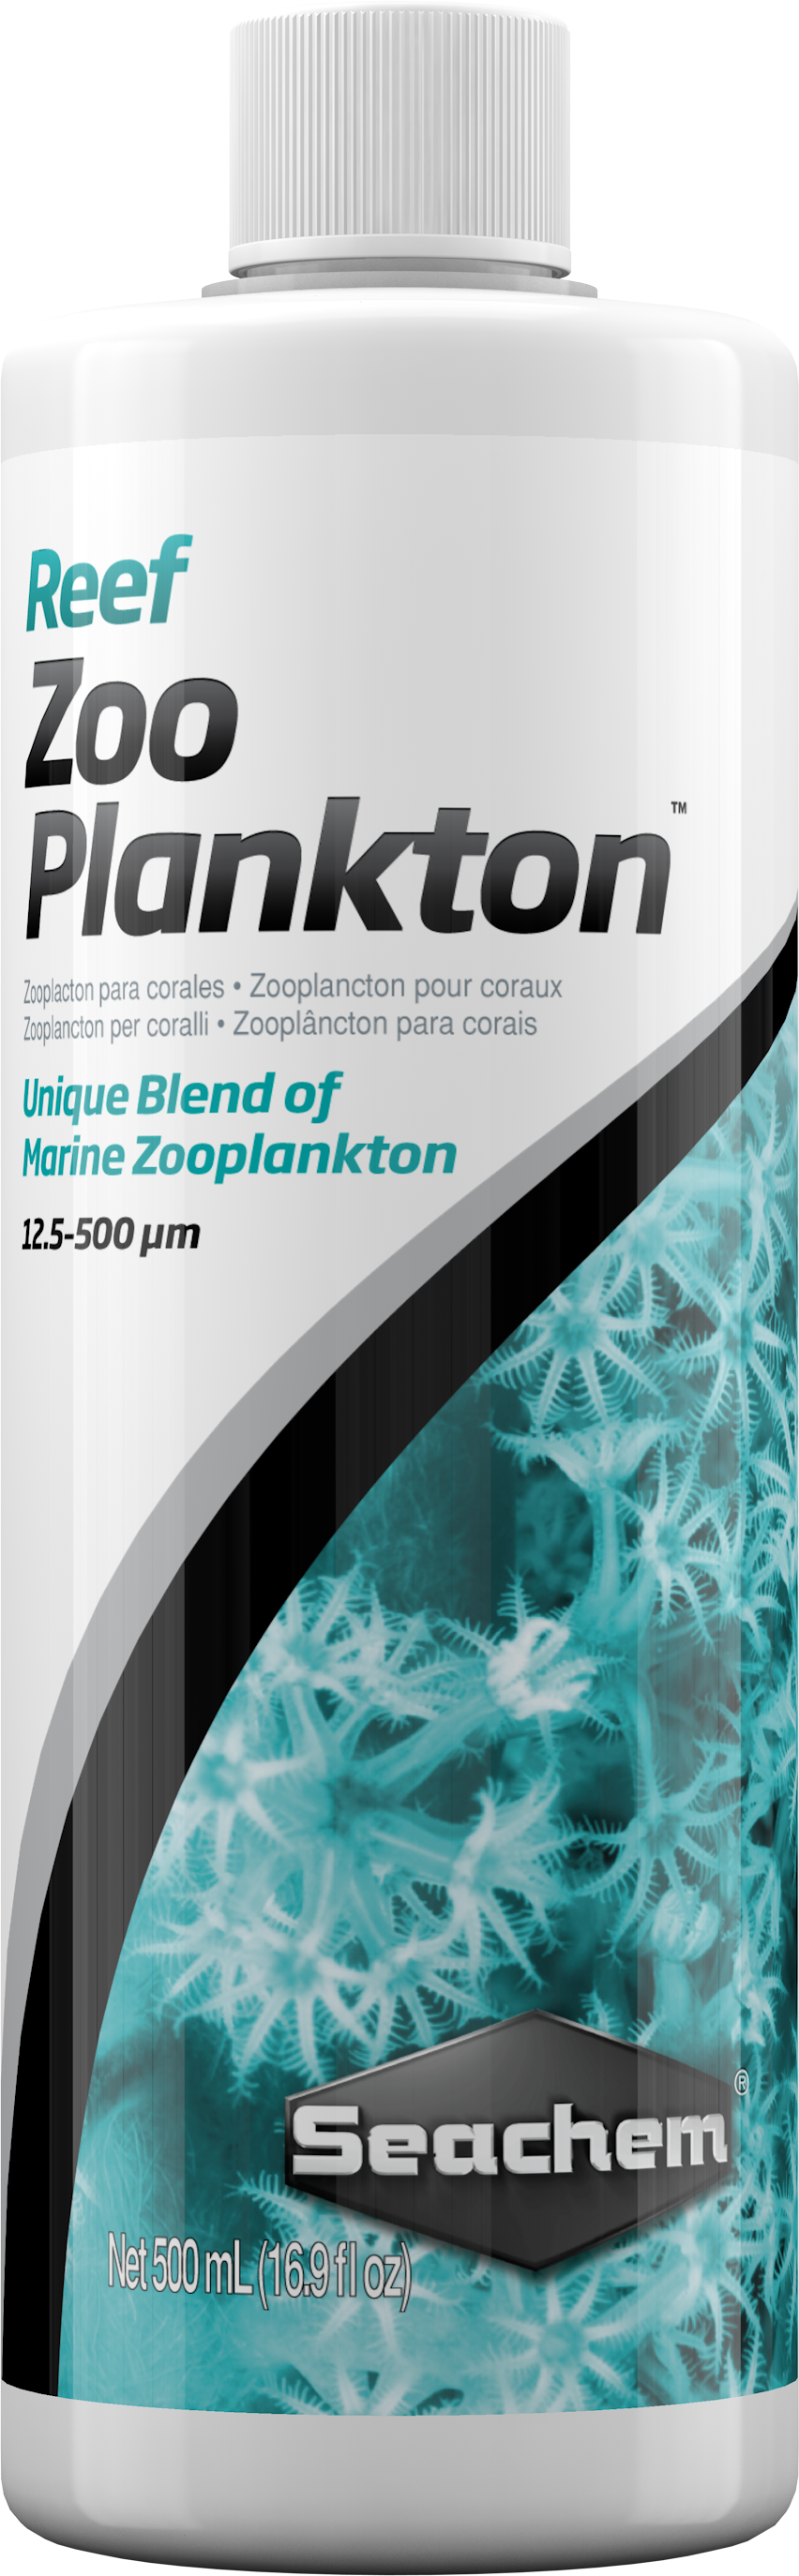 Seachem Reef Zooplankton, Marine Zooplankton Blend, 16.9-oz Bottle